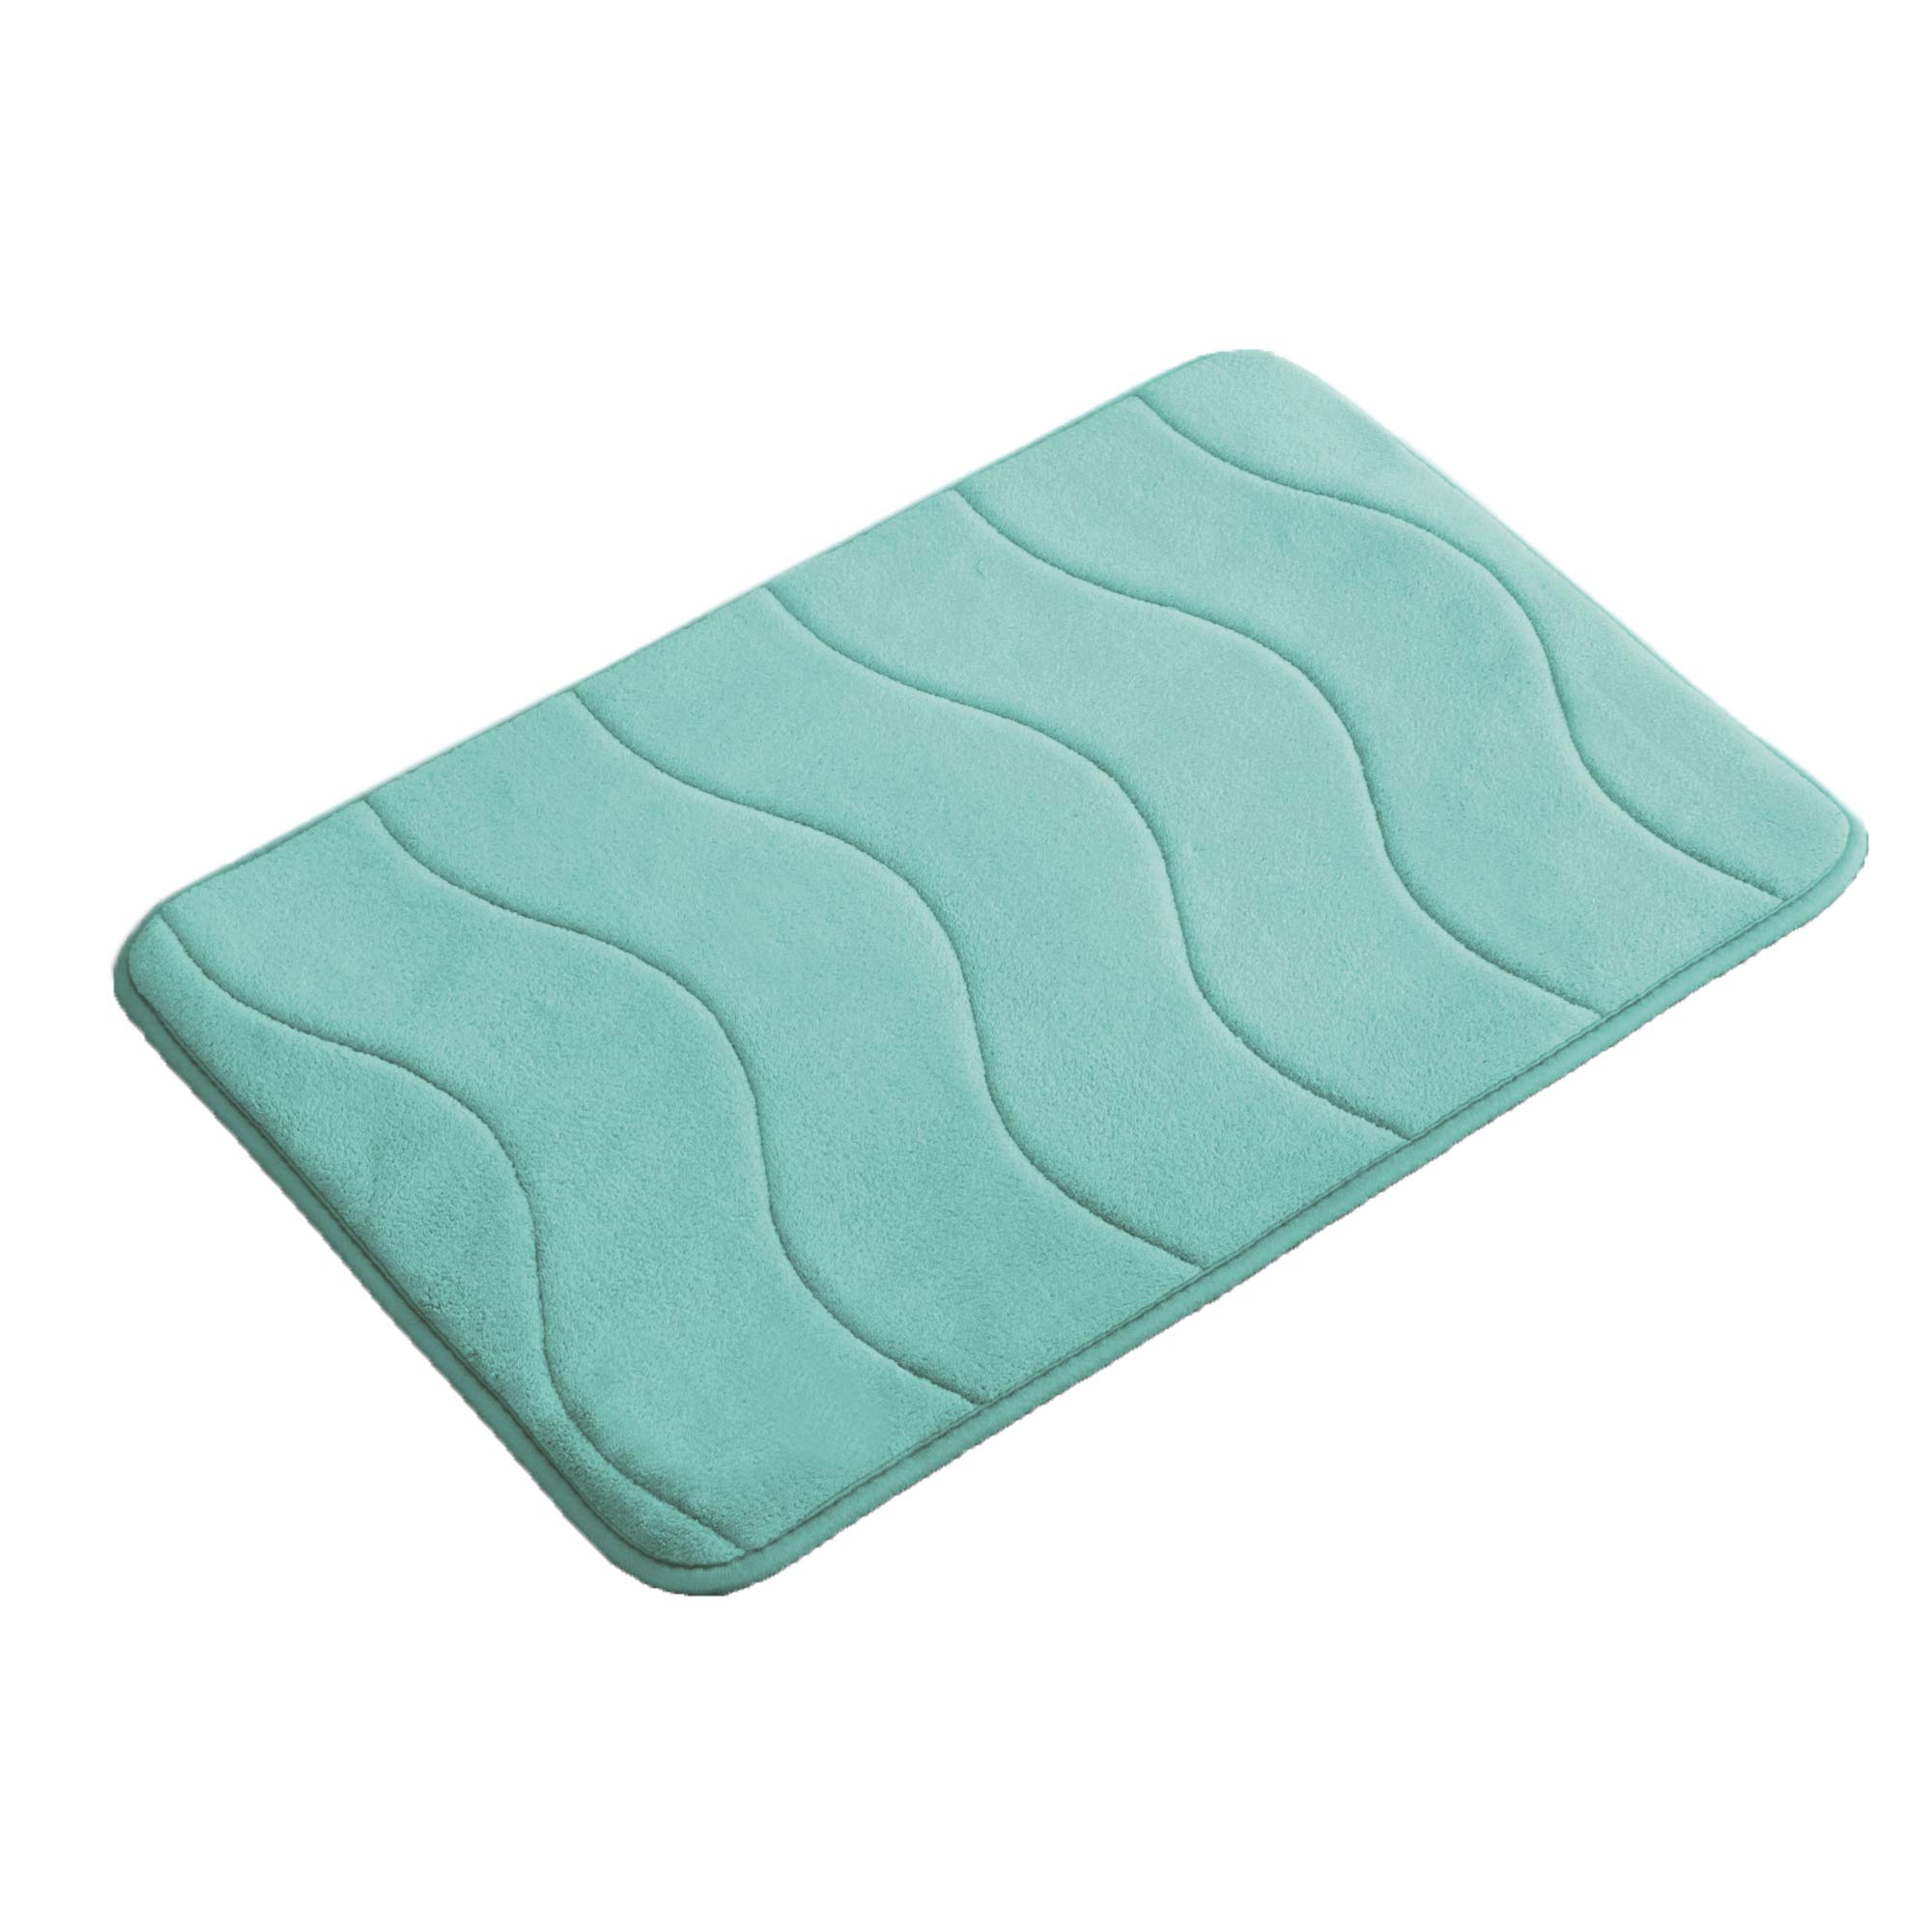 Premium Memory Foam 17x24 inch Absorbent Soft Microfibers of Bathroom Rug Non-Slip Bath Rugs - Aqua Green by Flamingo P (Image #1)